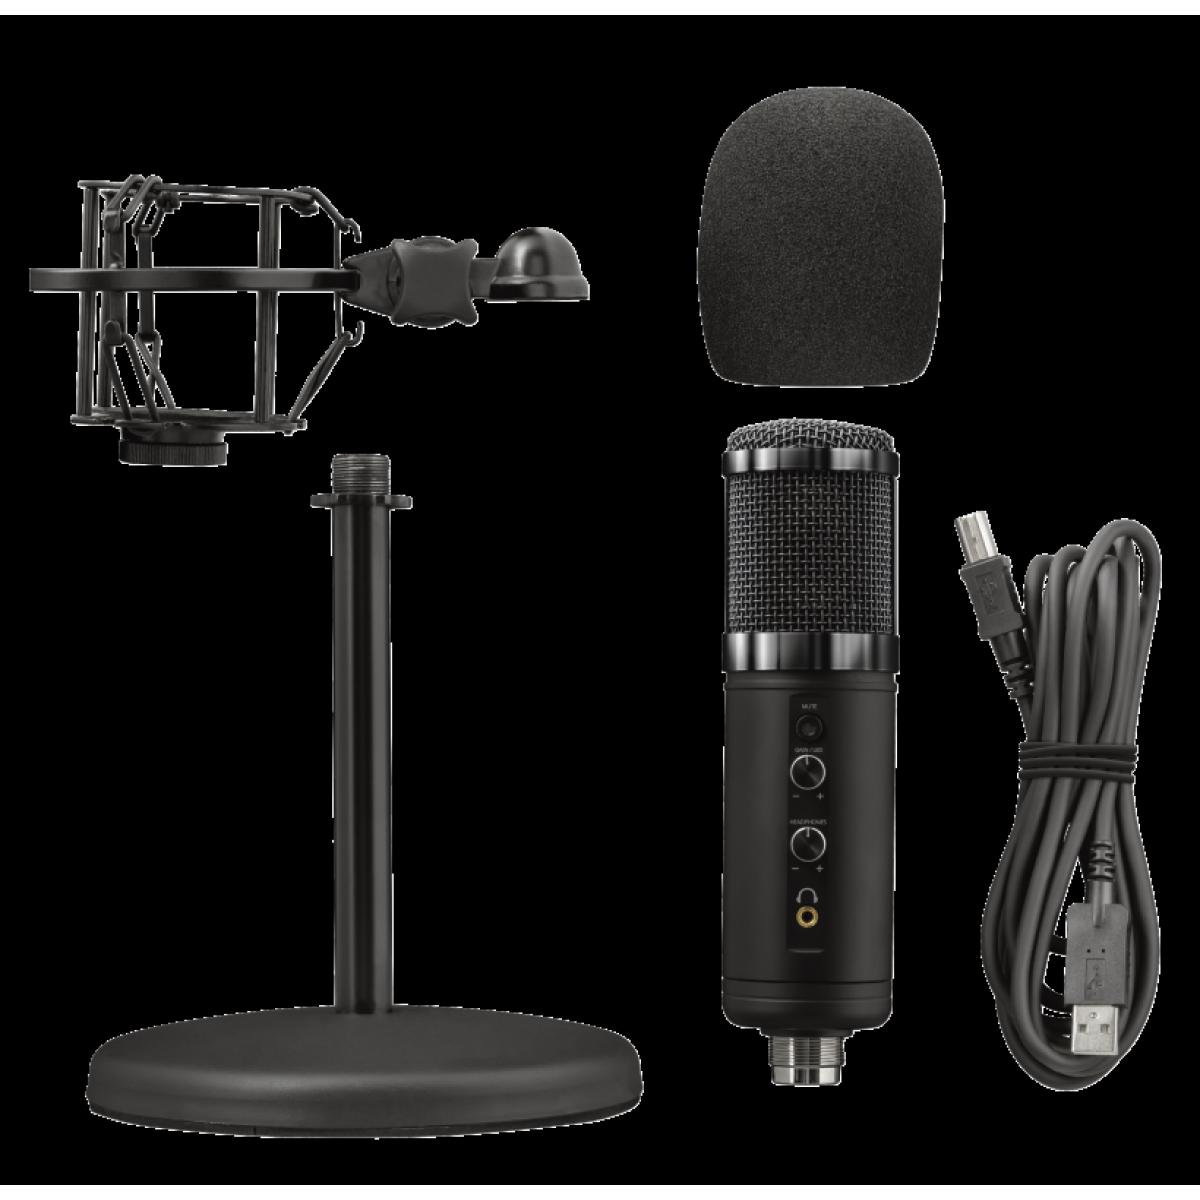 Microfone Gamer Trust, GXT 256 Exxo Streaming, USB, T23510